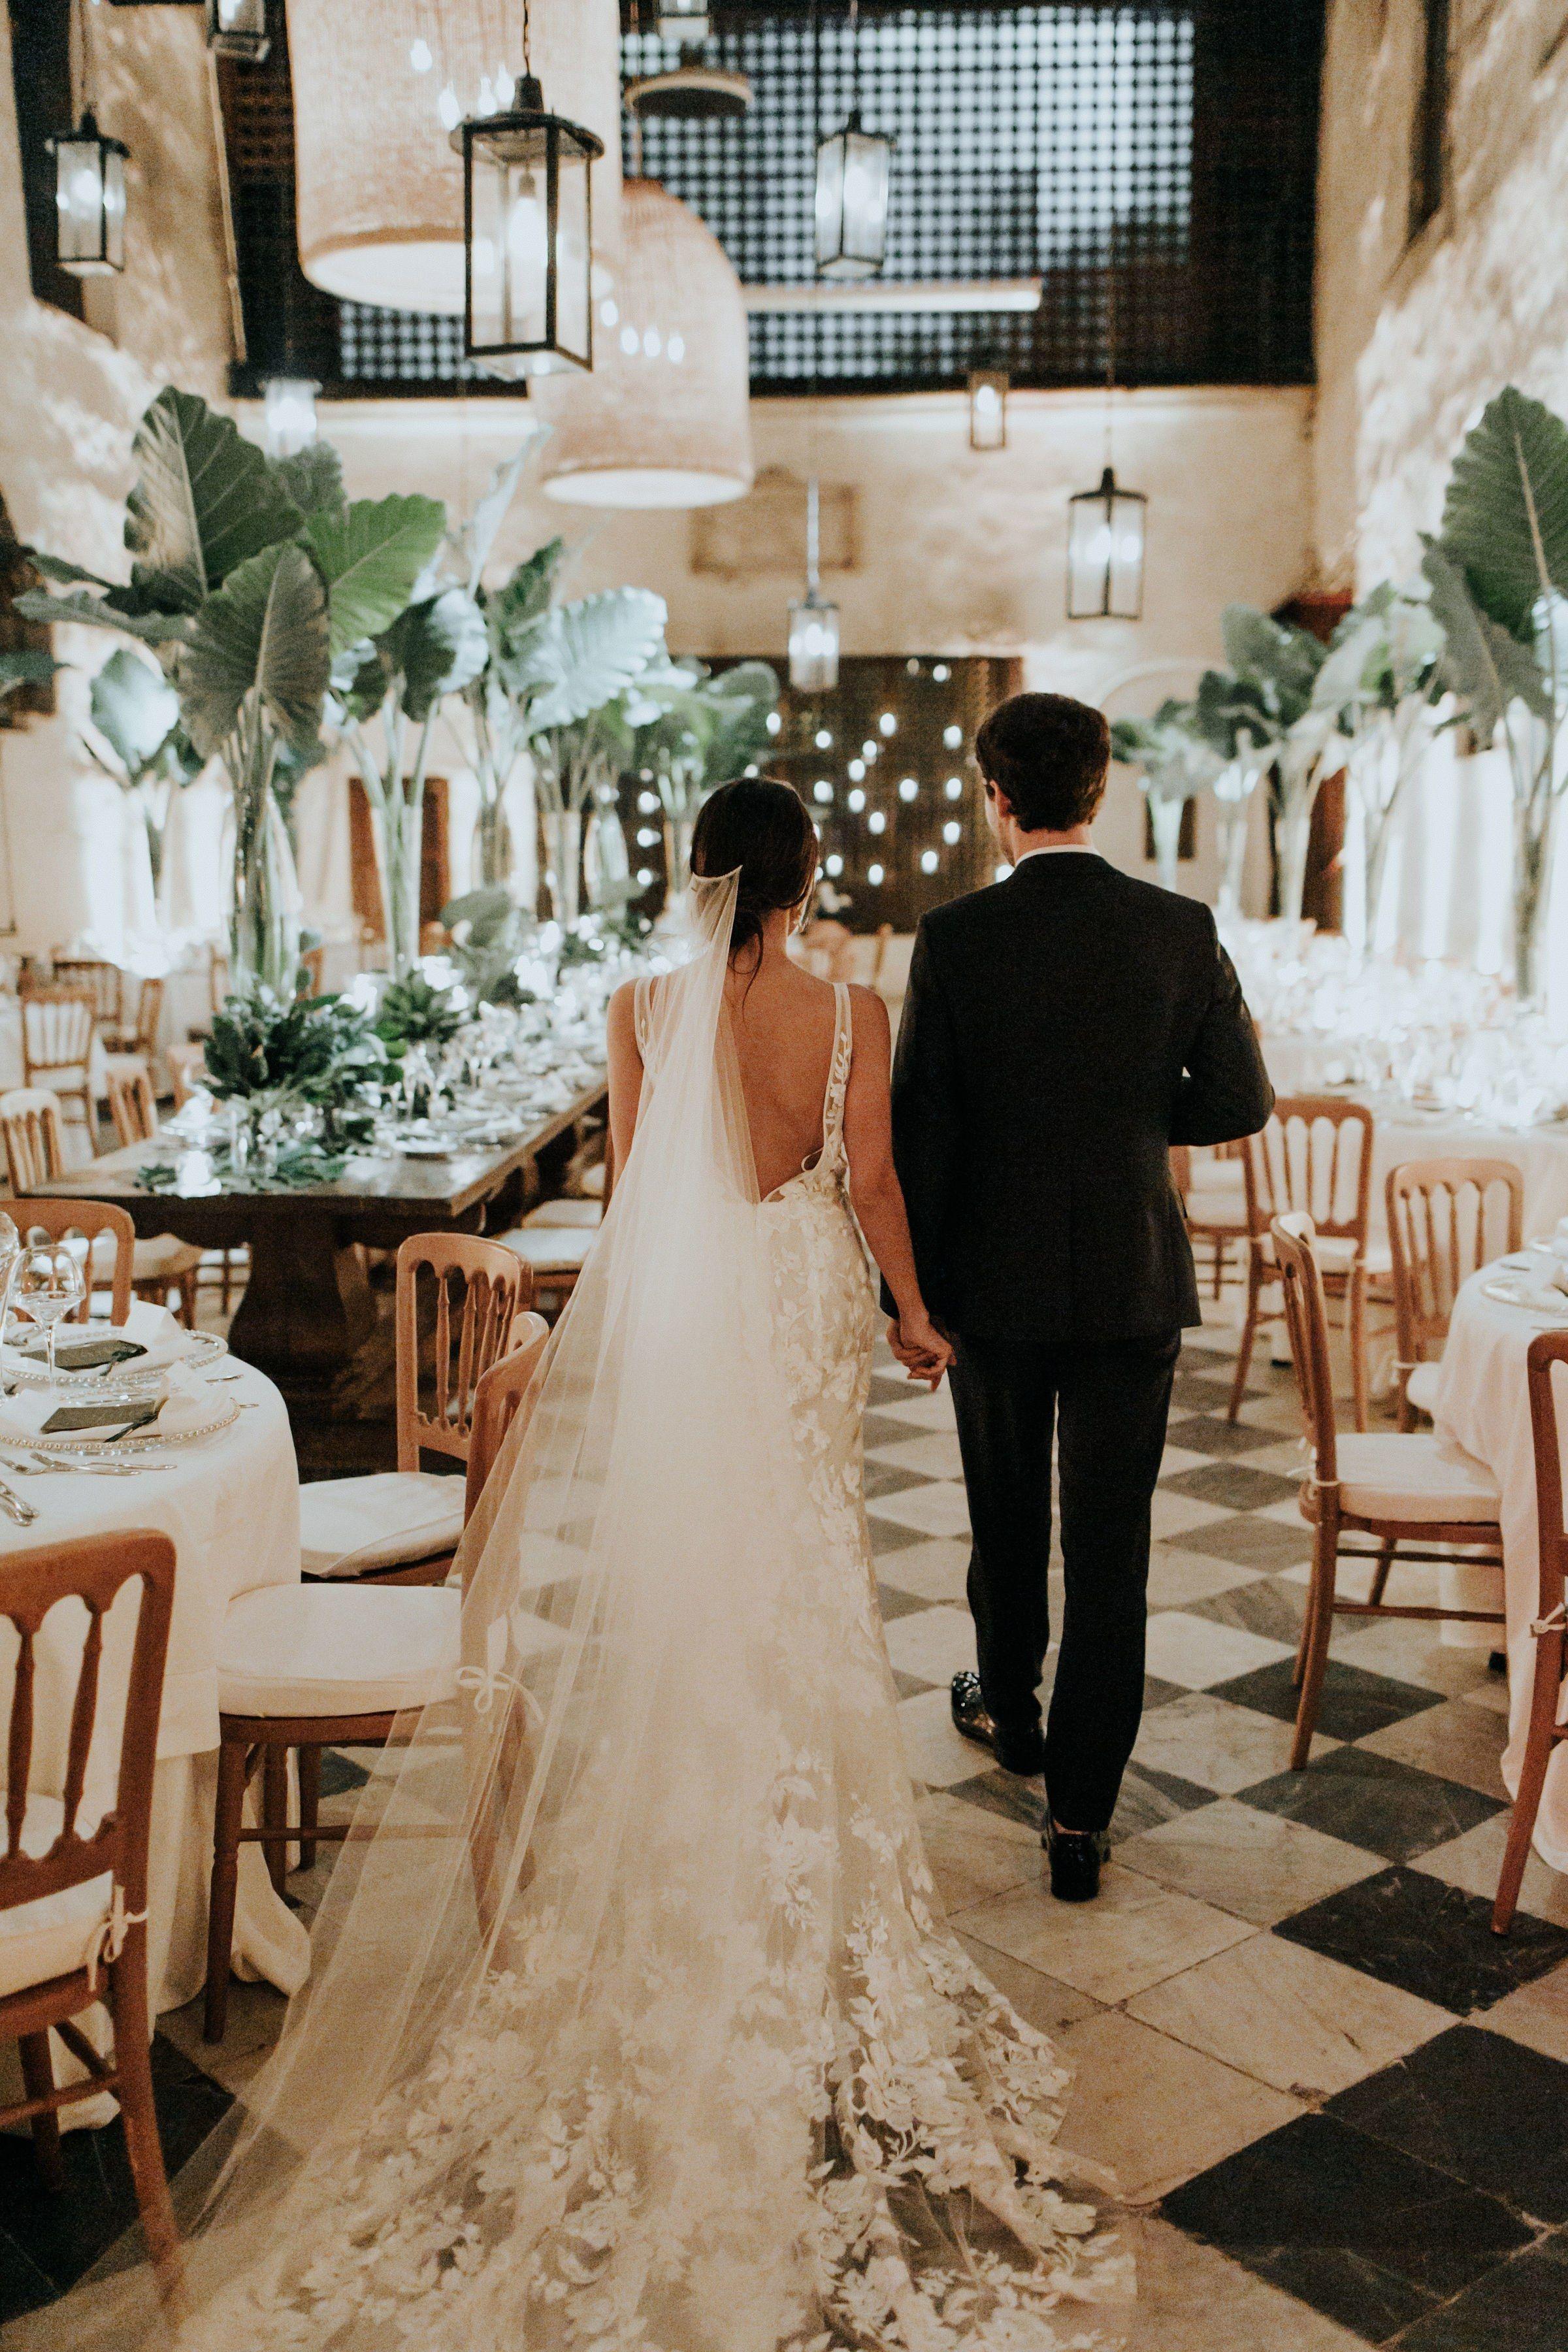 A Romantic Destination Wedding in Historic Cartagena